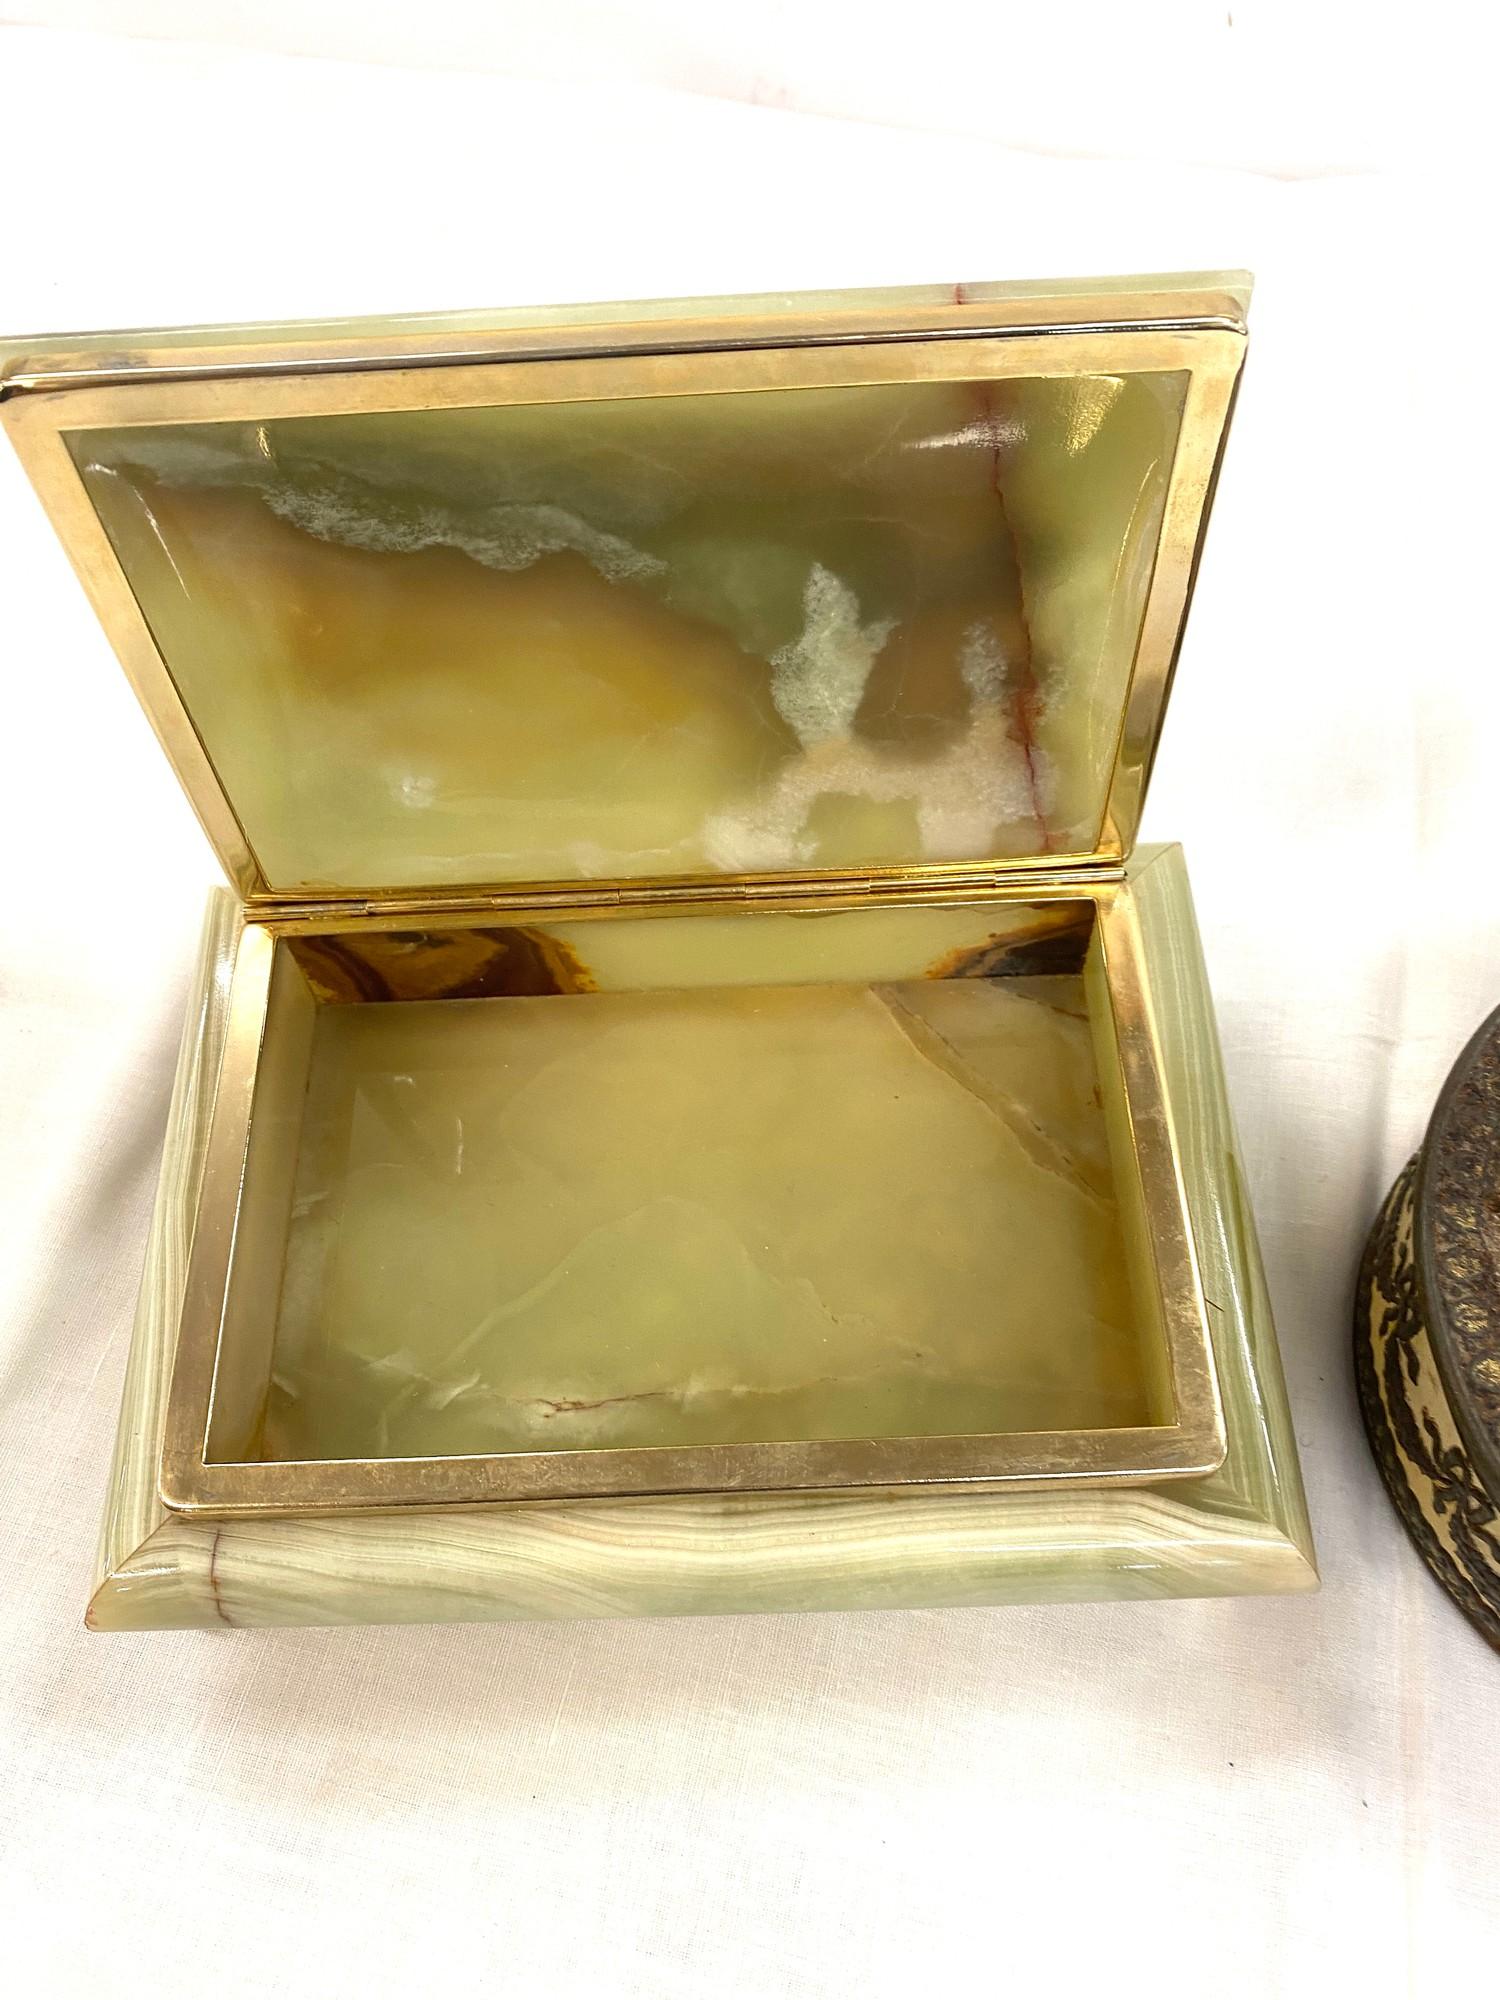 Onyx Cigarette box, large crucifix and a commemorative tin - Image 4 of 4